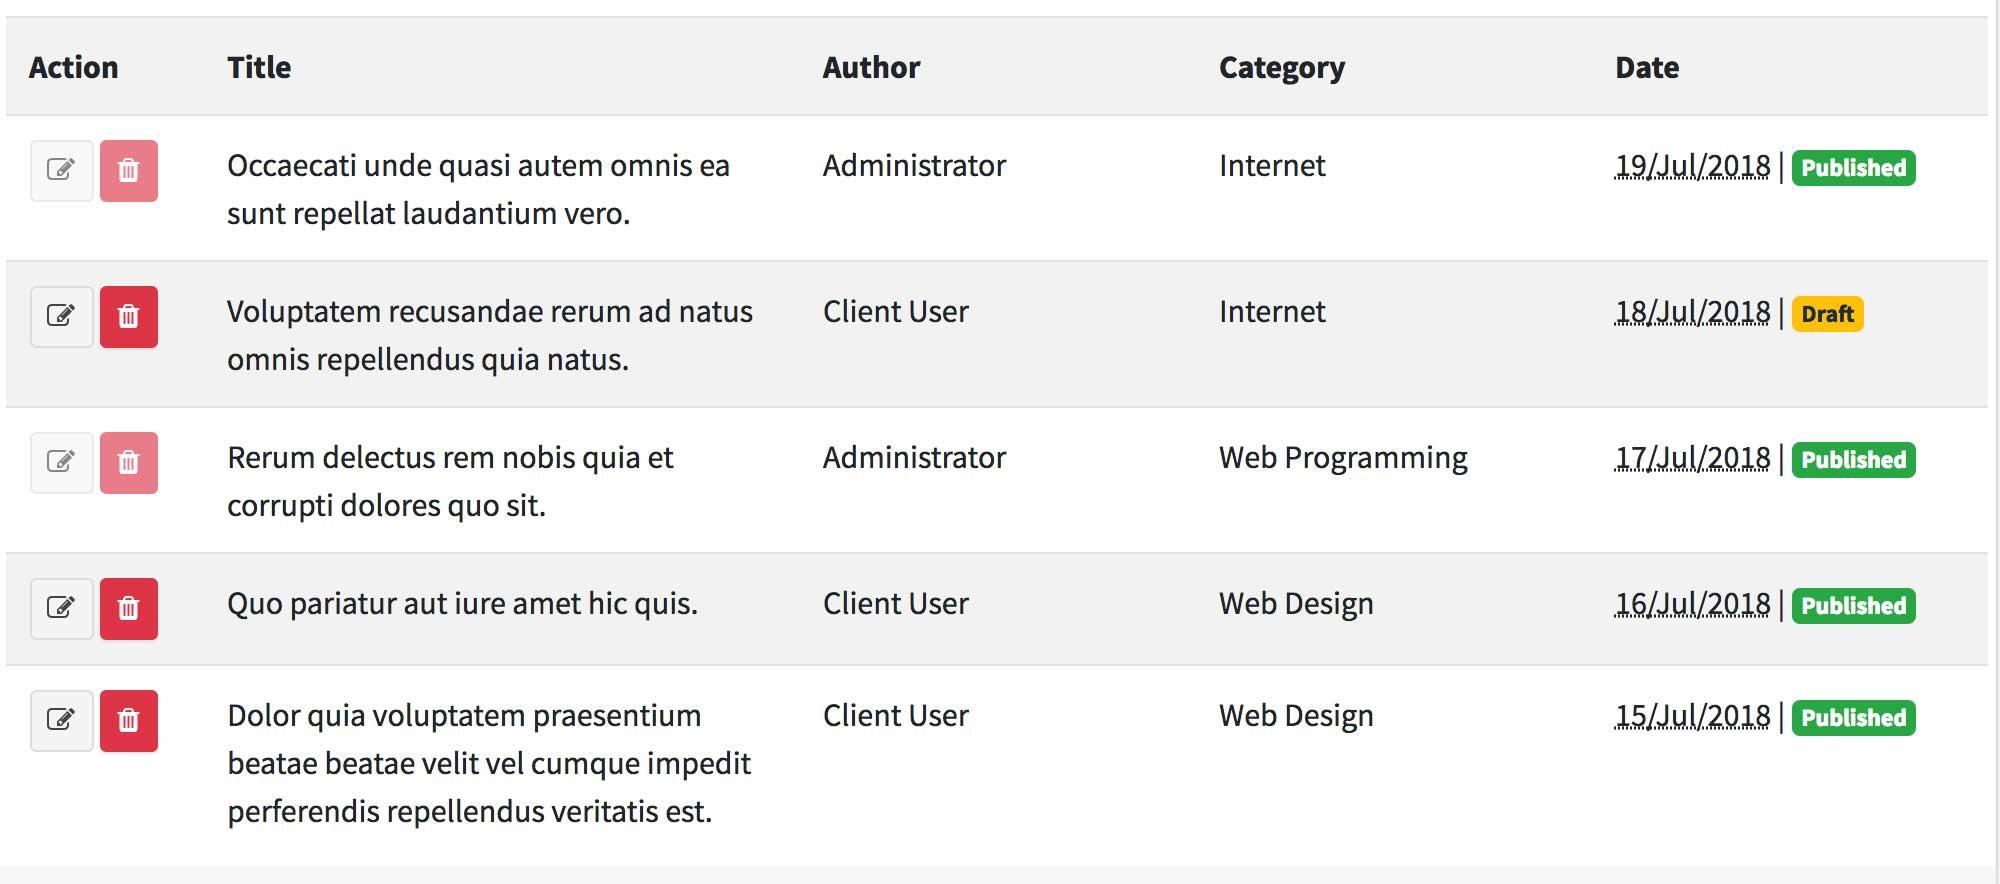 Access Control with Laratrust - WordPress-Like Blog Laravel 5.7 and AdminLTE 3 (17-2)